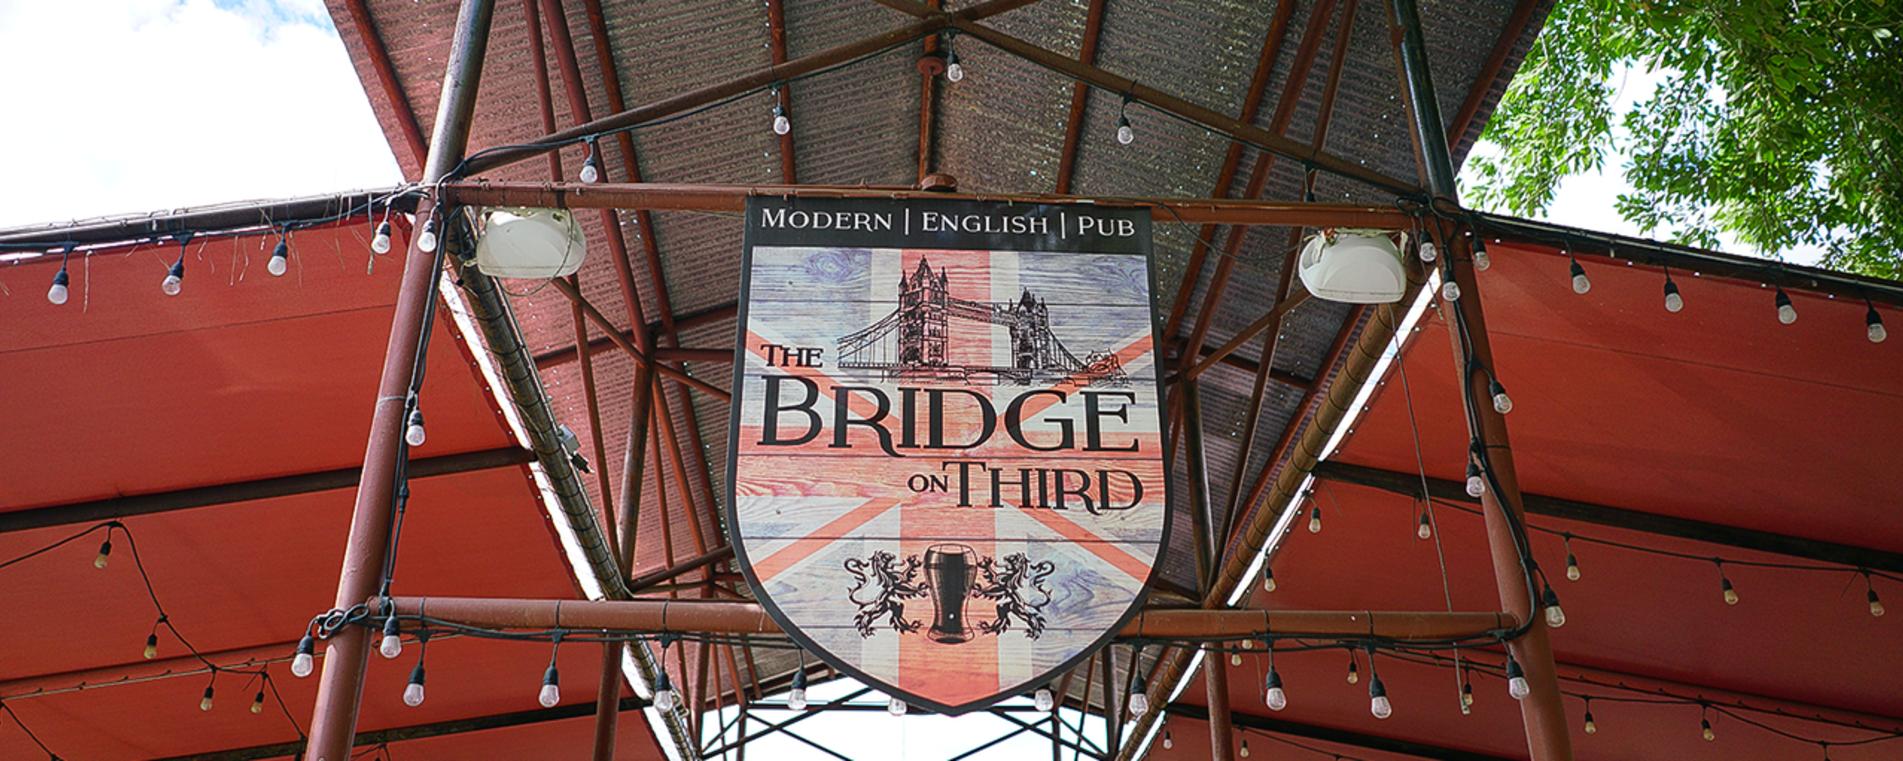 The Bridge On Third